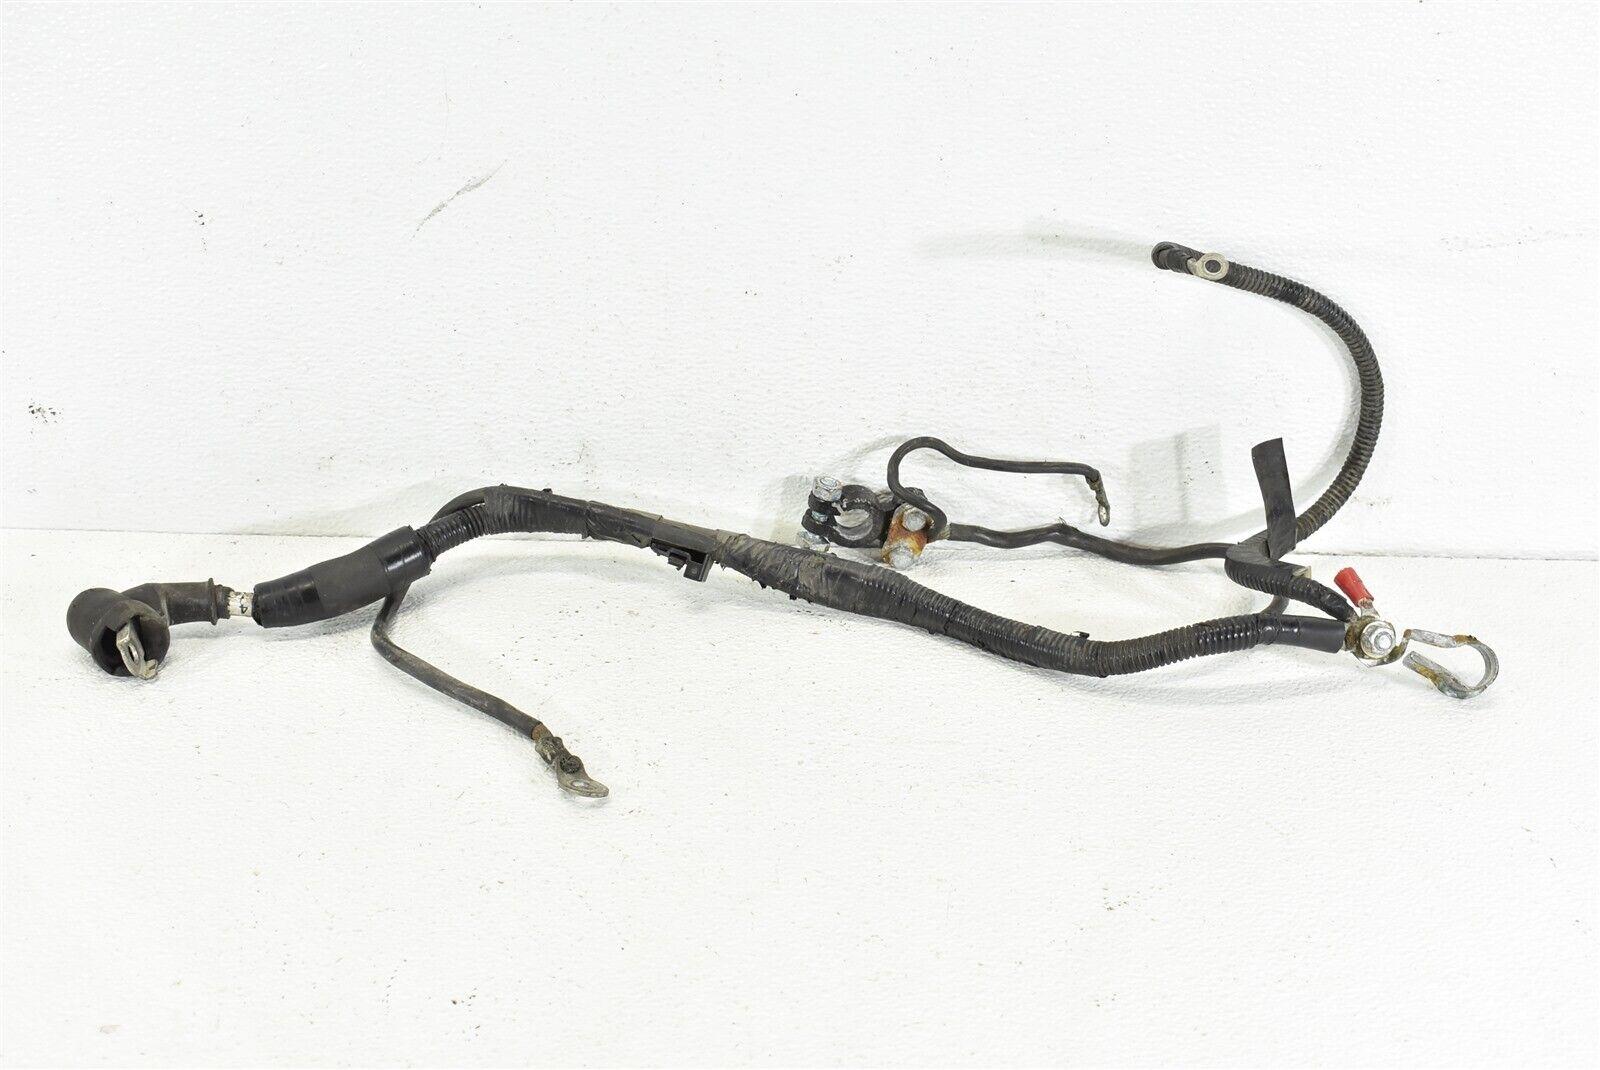 2004-2005 Subaru Impreza WRX STI Starter Wiring Harness MT